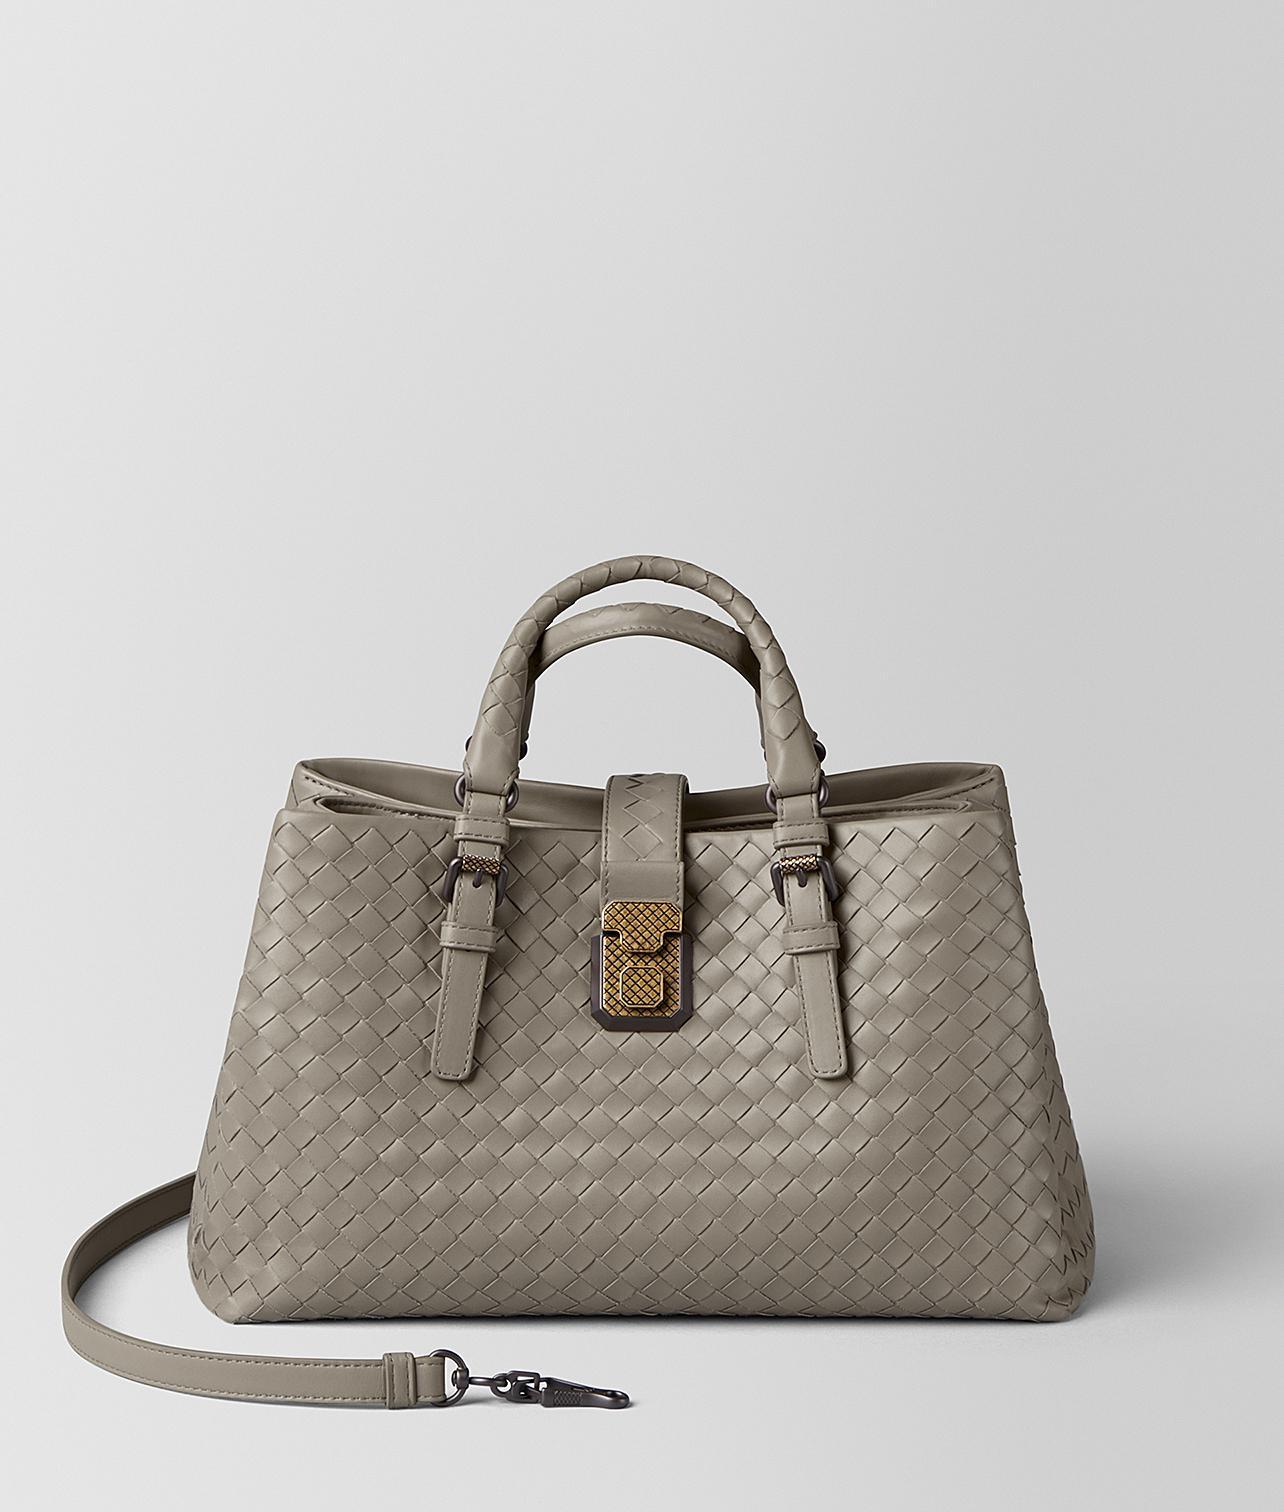 8ec685bbb7d7 Bottega Veneta. Women s Dark Cement Intrecciato Calf Roma Bag